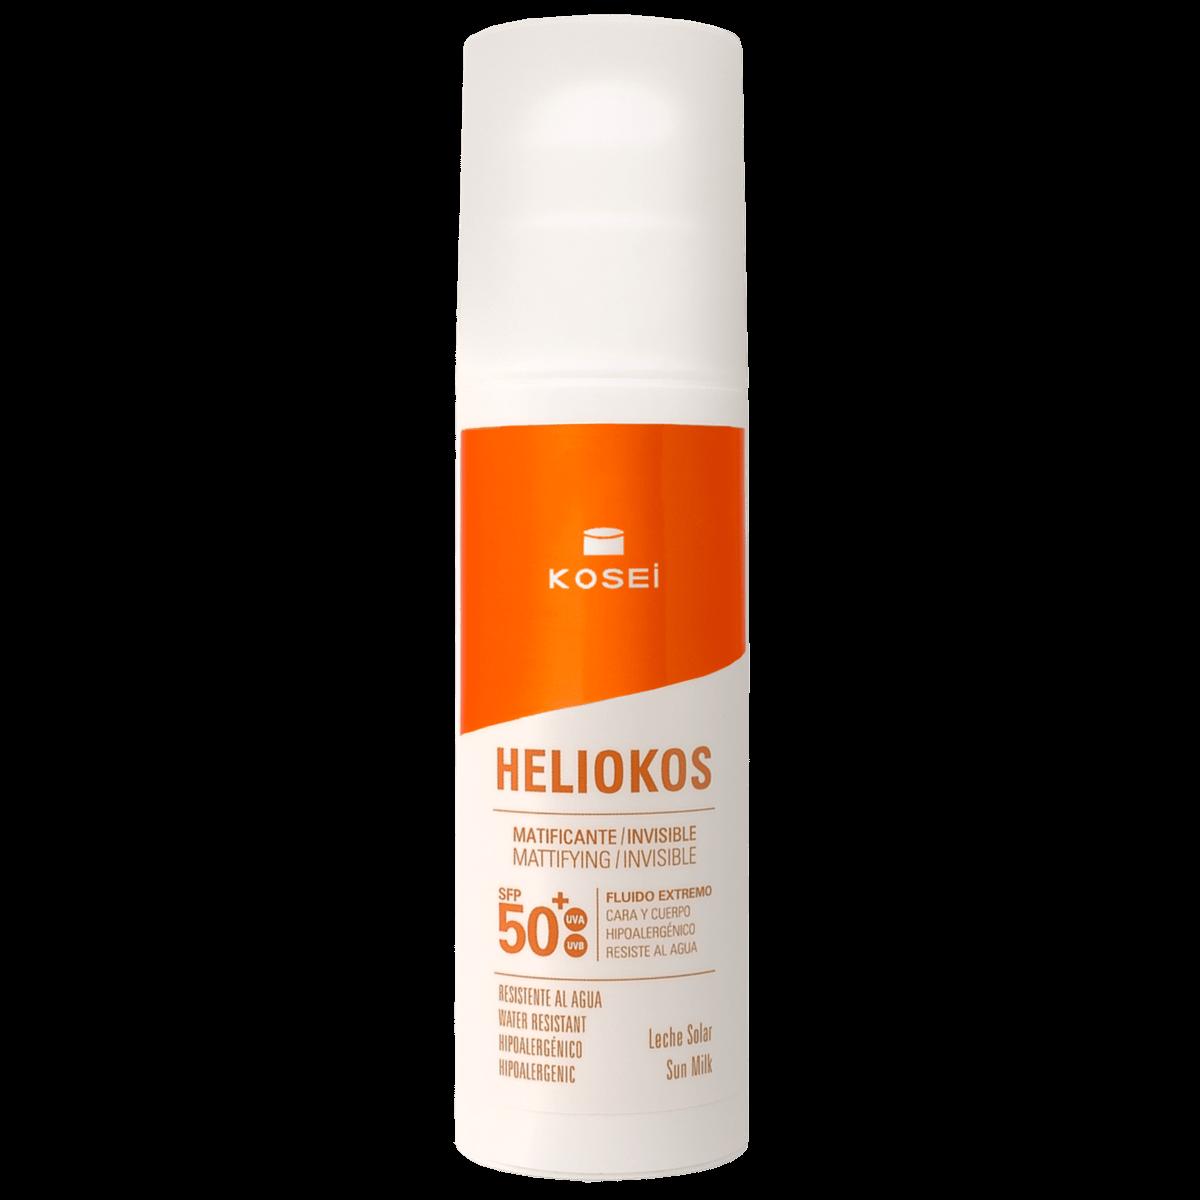 Protector solar 50 Heliokos fluido extremo invisible